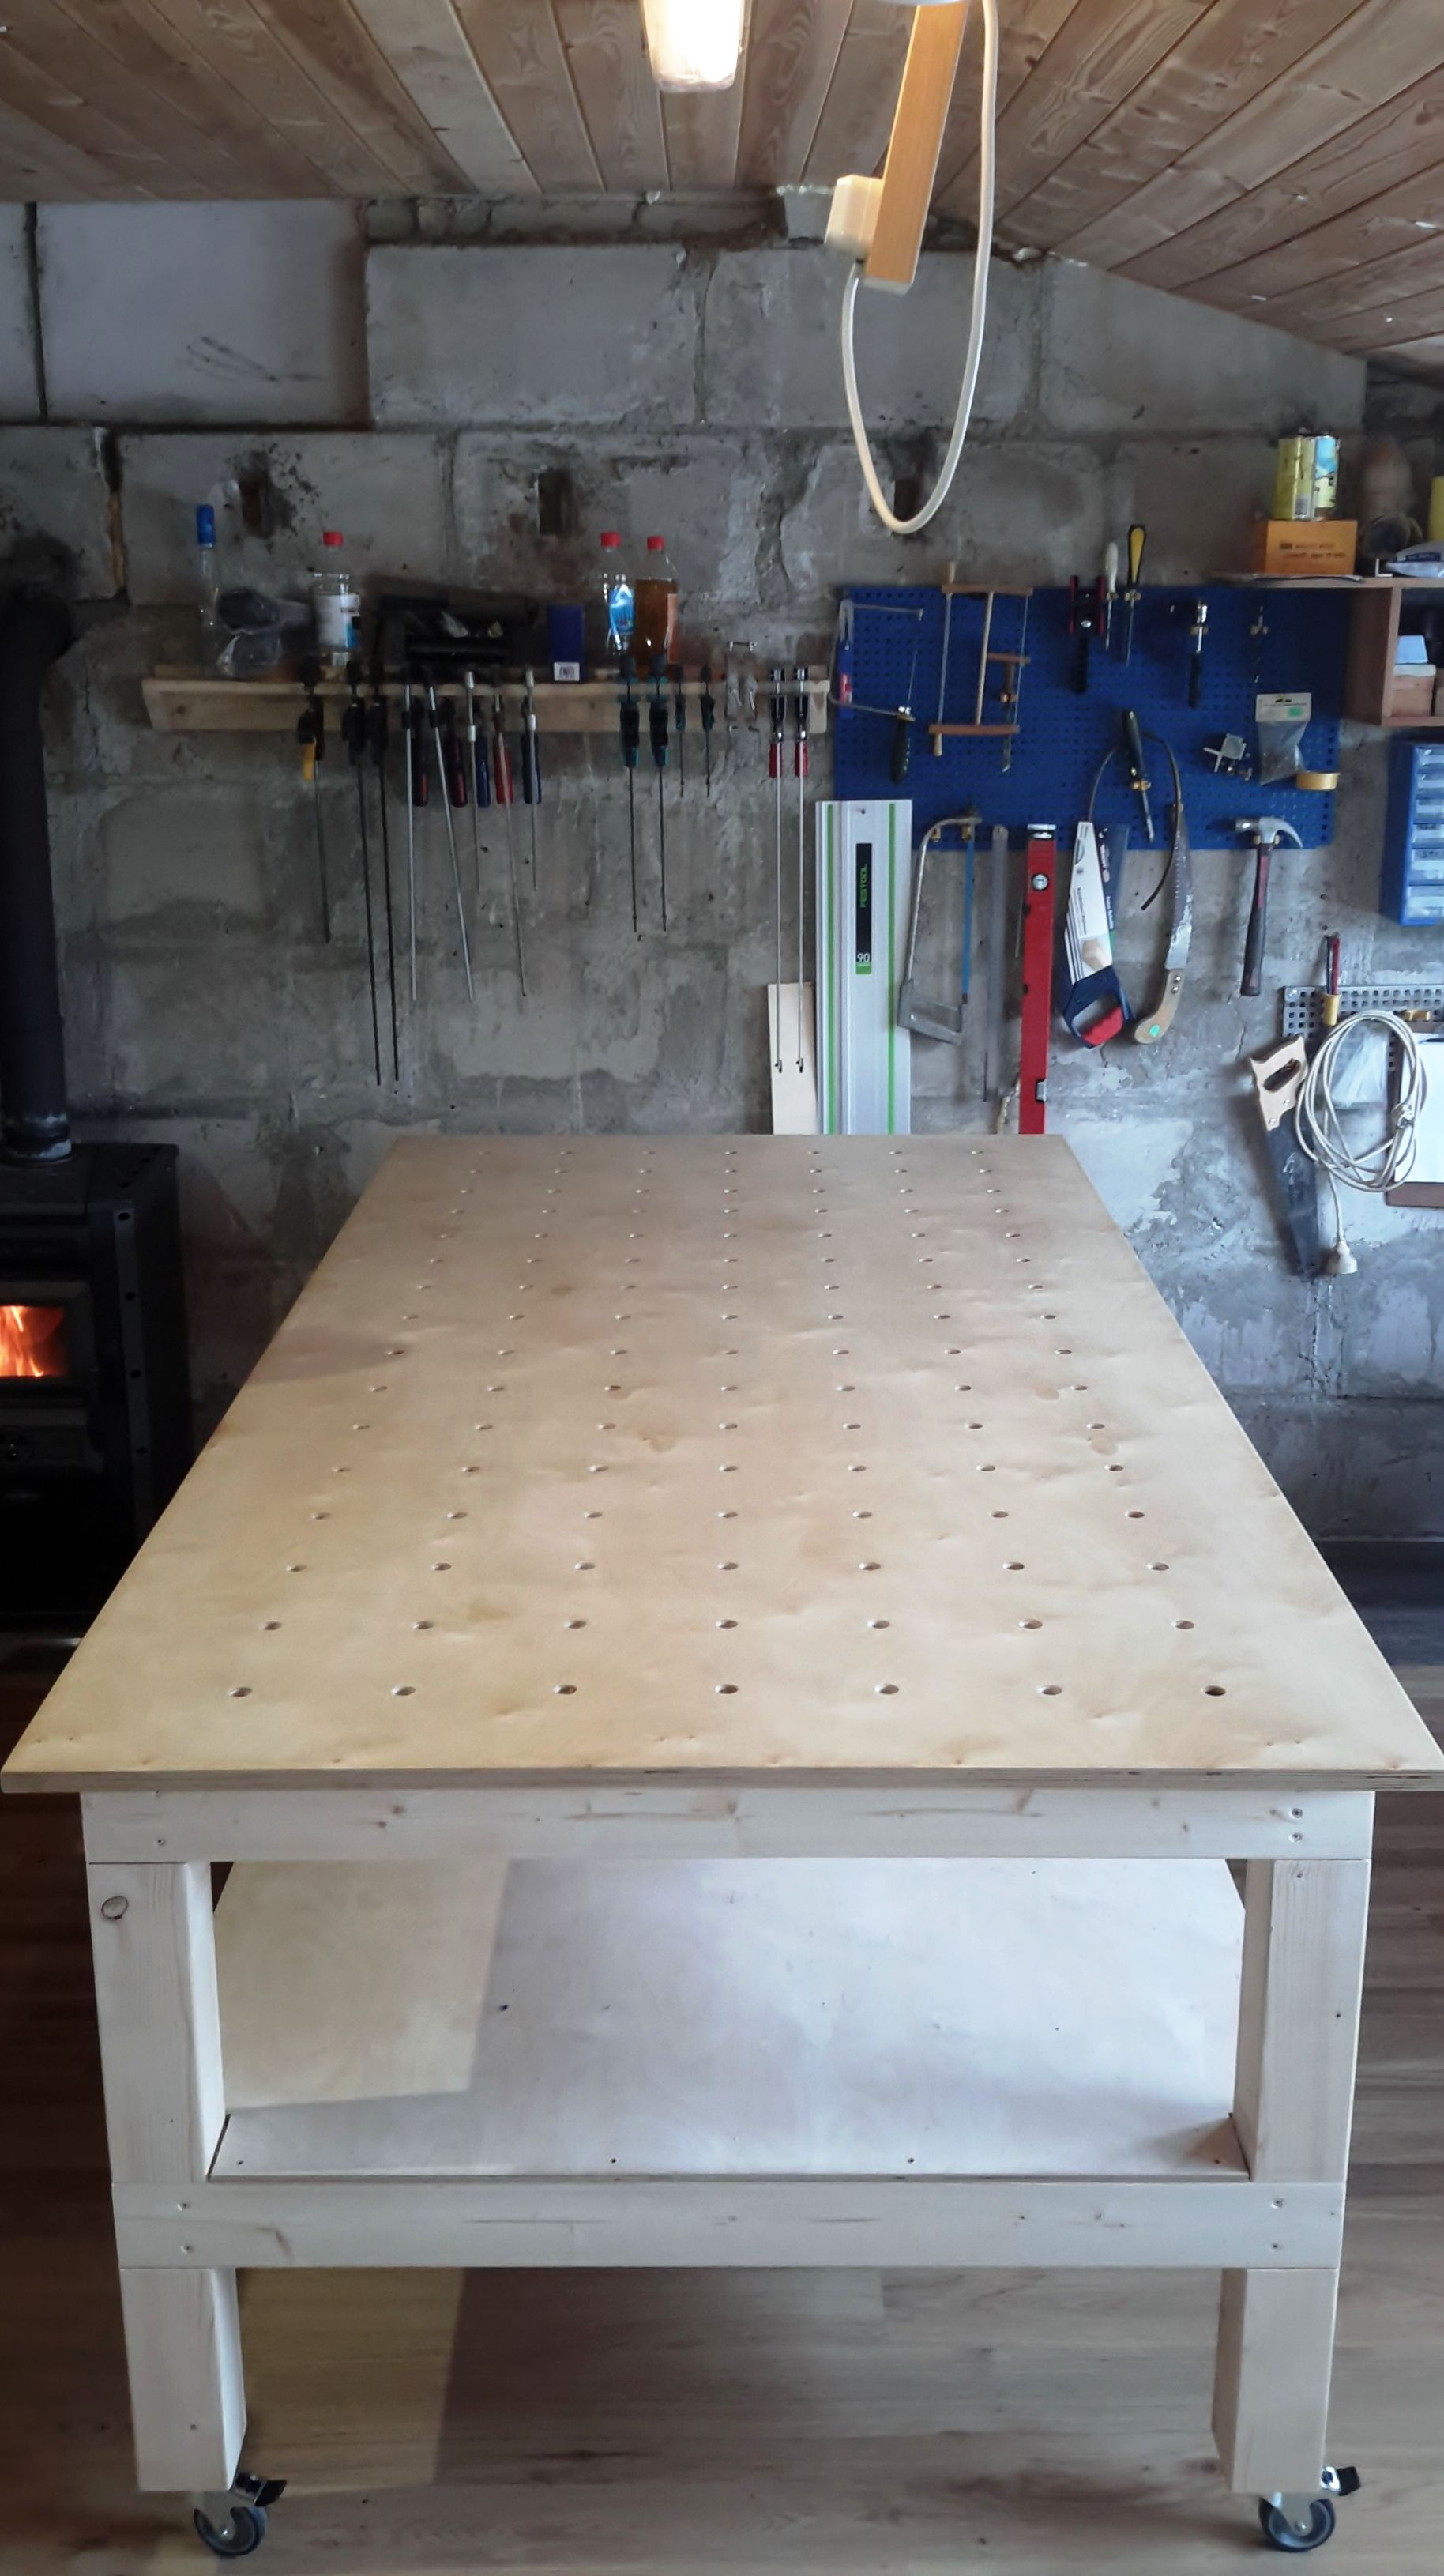 Big Workbench On Wheels Workbench On Wheels Diy Woodworking Wood Jig